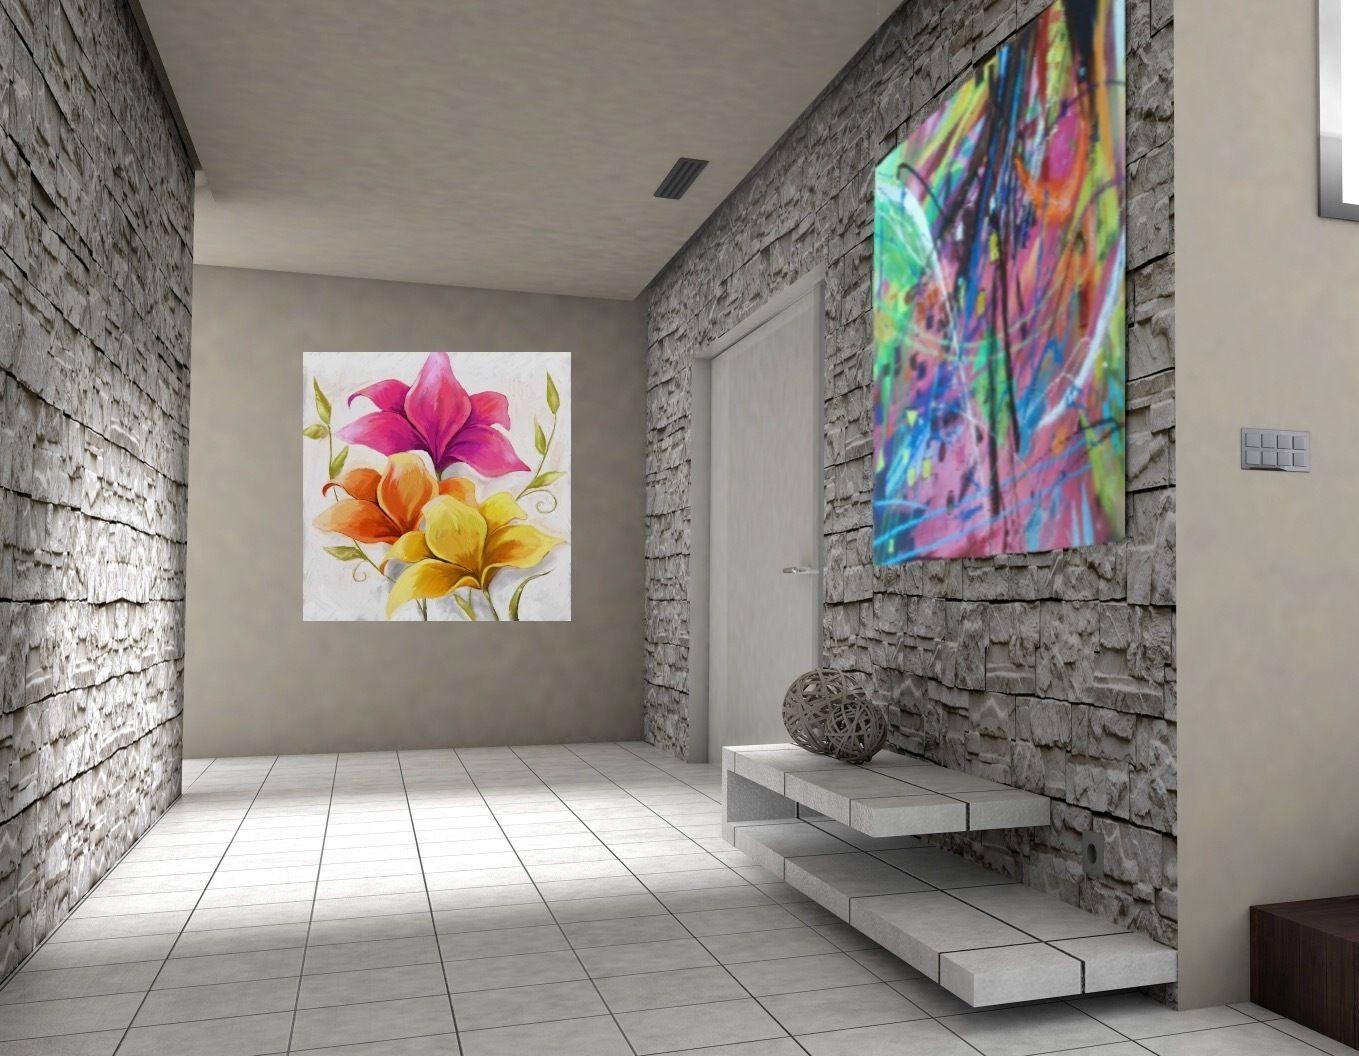 1359 1056 cuadros modernos cuadros de - Cuadros murales para pared ...